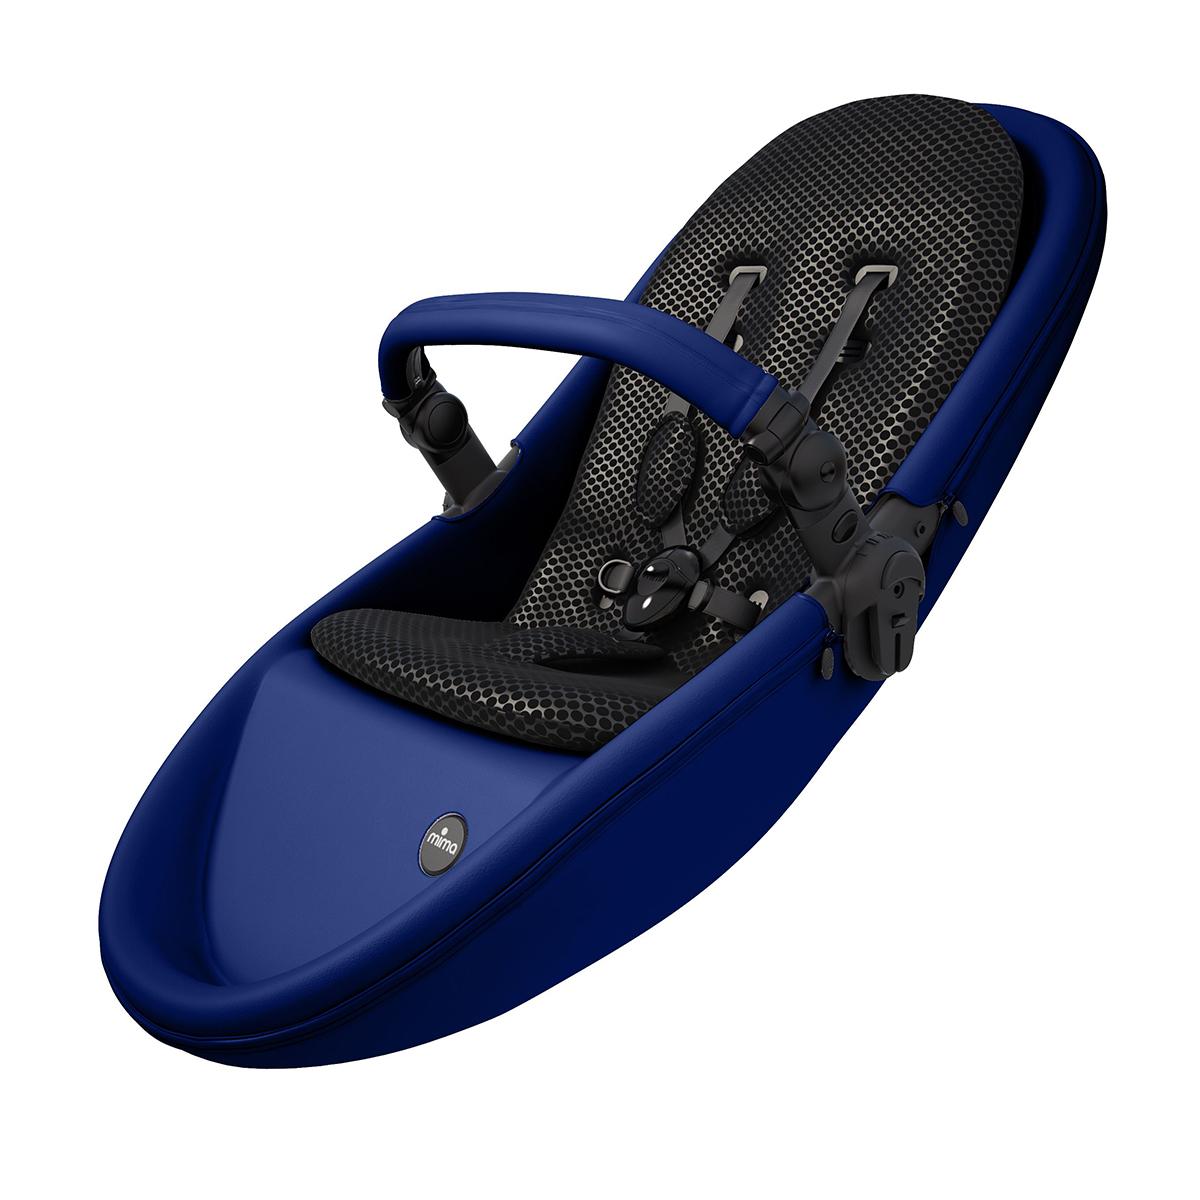 Купить Коляски зима-лето 2 в 1, Базовый набор Mima Xari Royal Blue 30136 ТМ: mima, синий